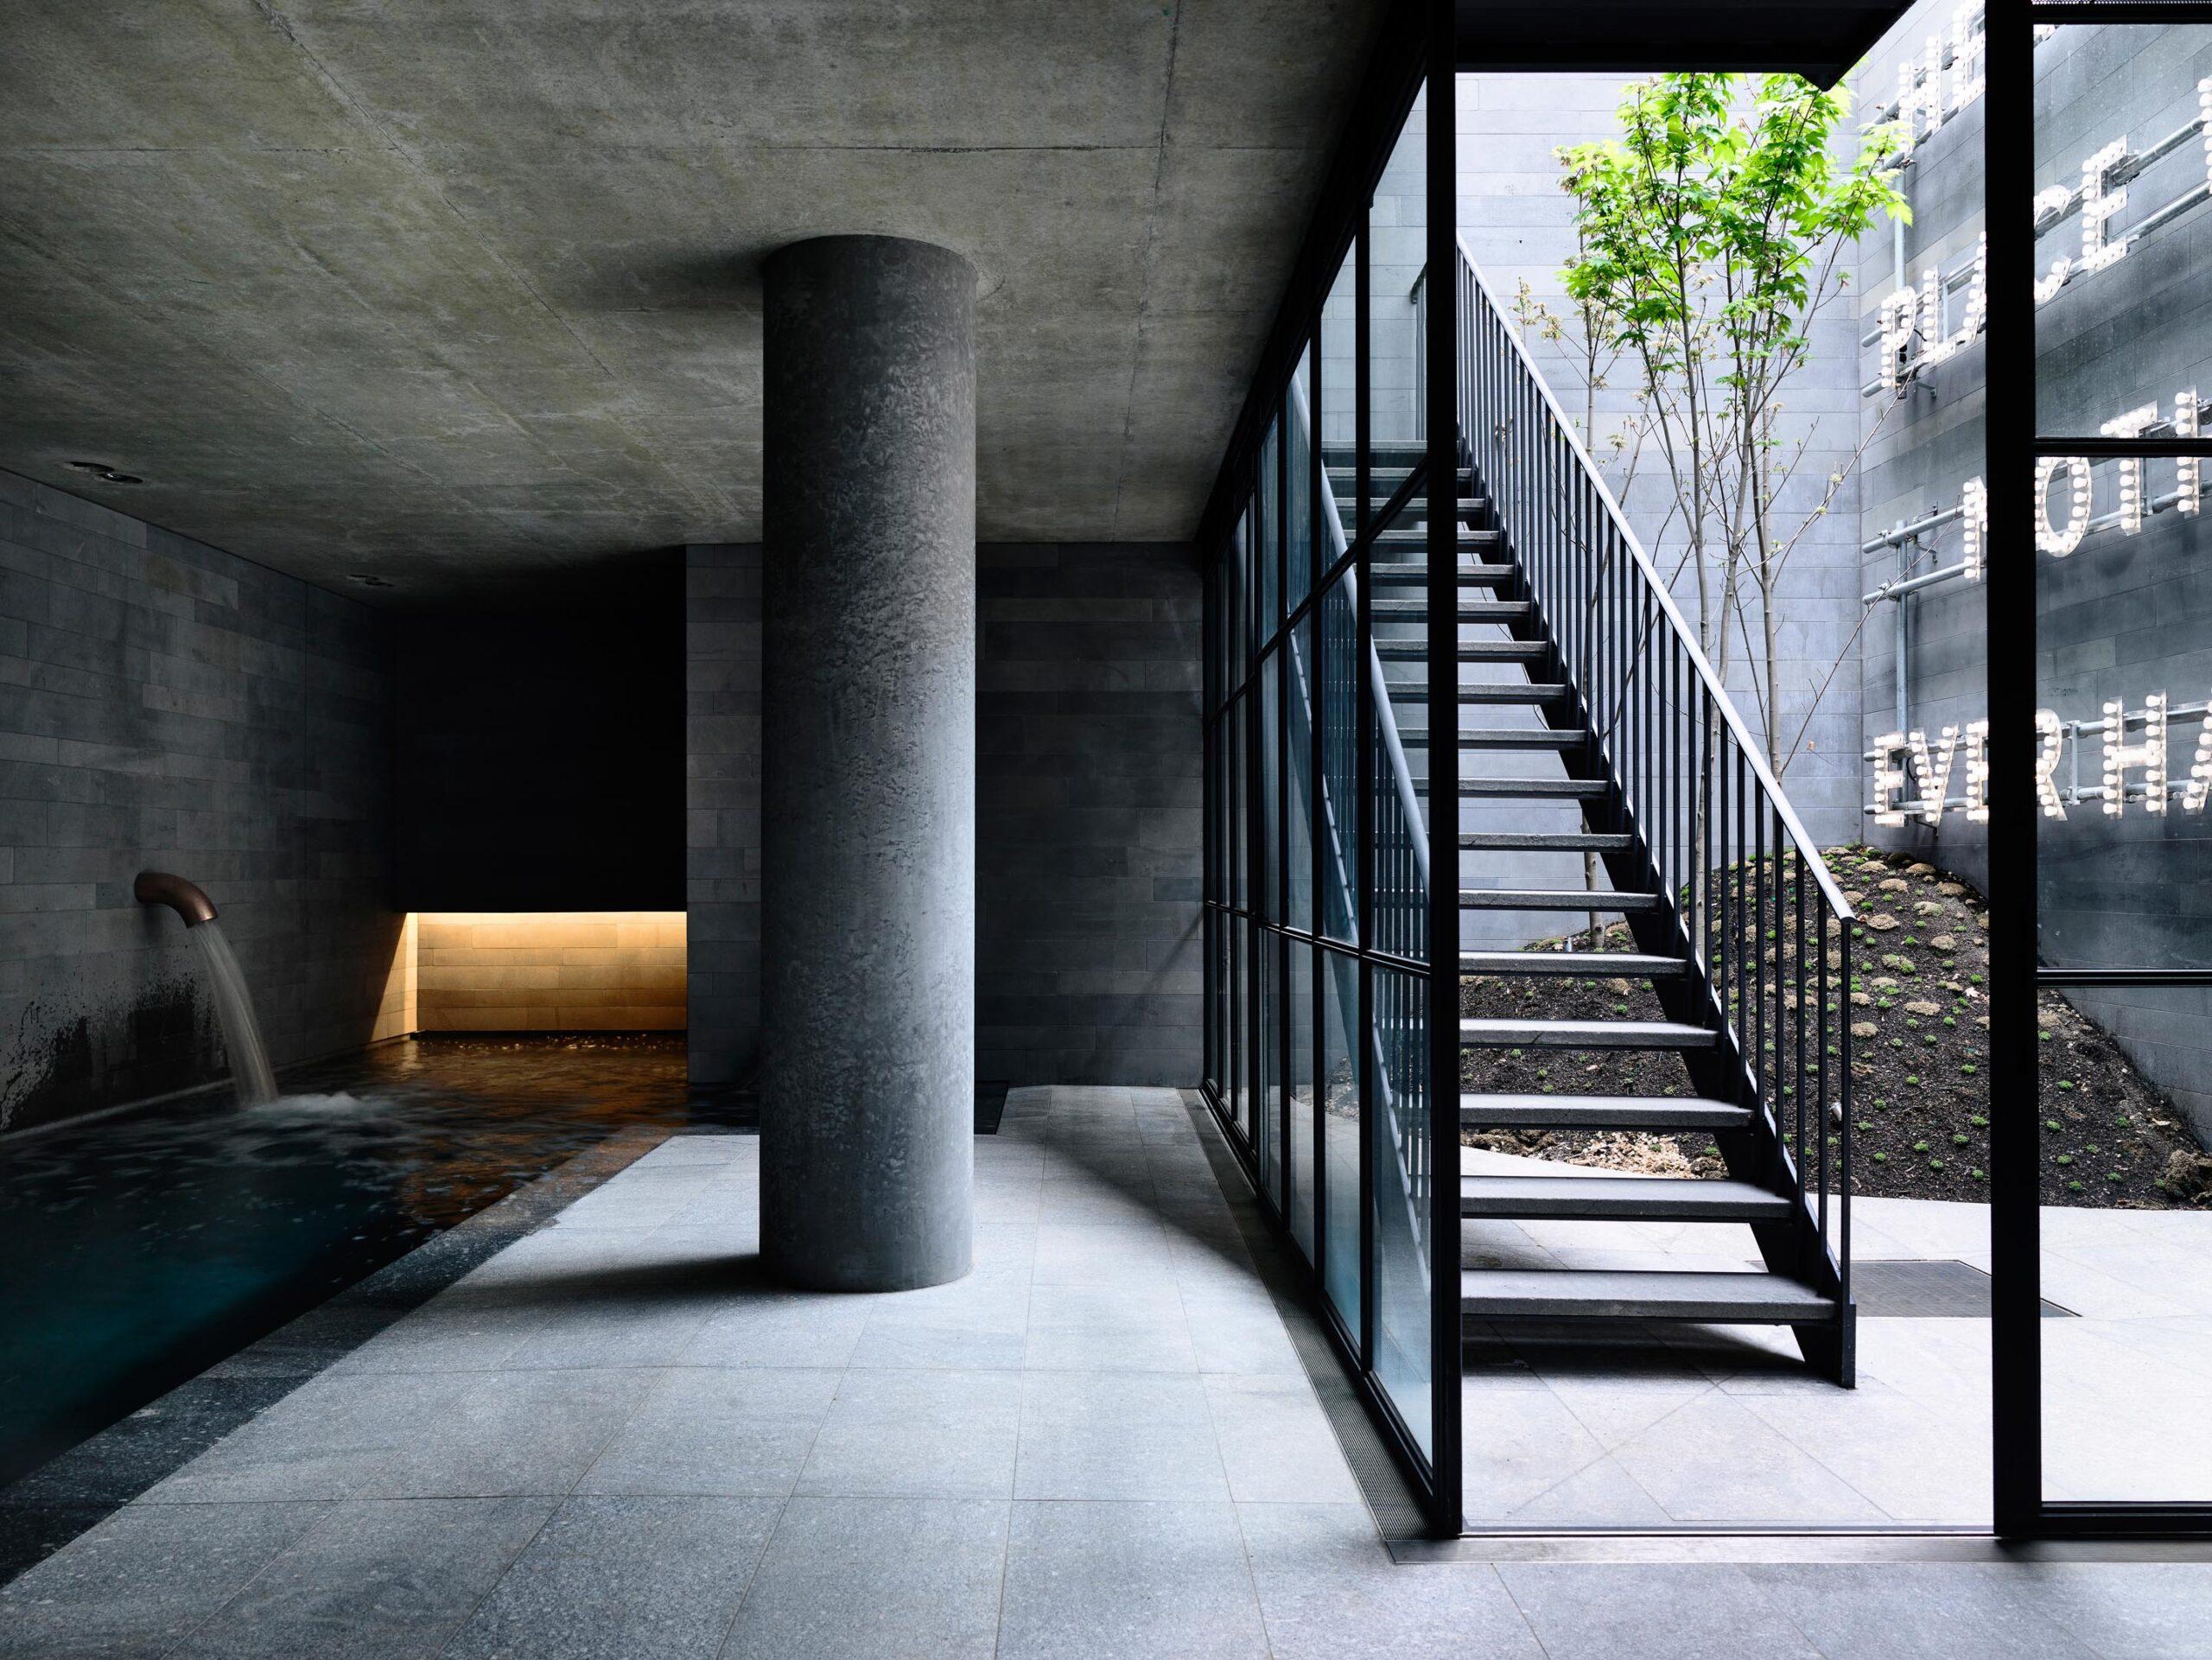 B.E Architecture, Broderick Ely, Jonathon Boucher, Andrew Piva, Melbourne, Australia